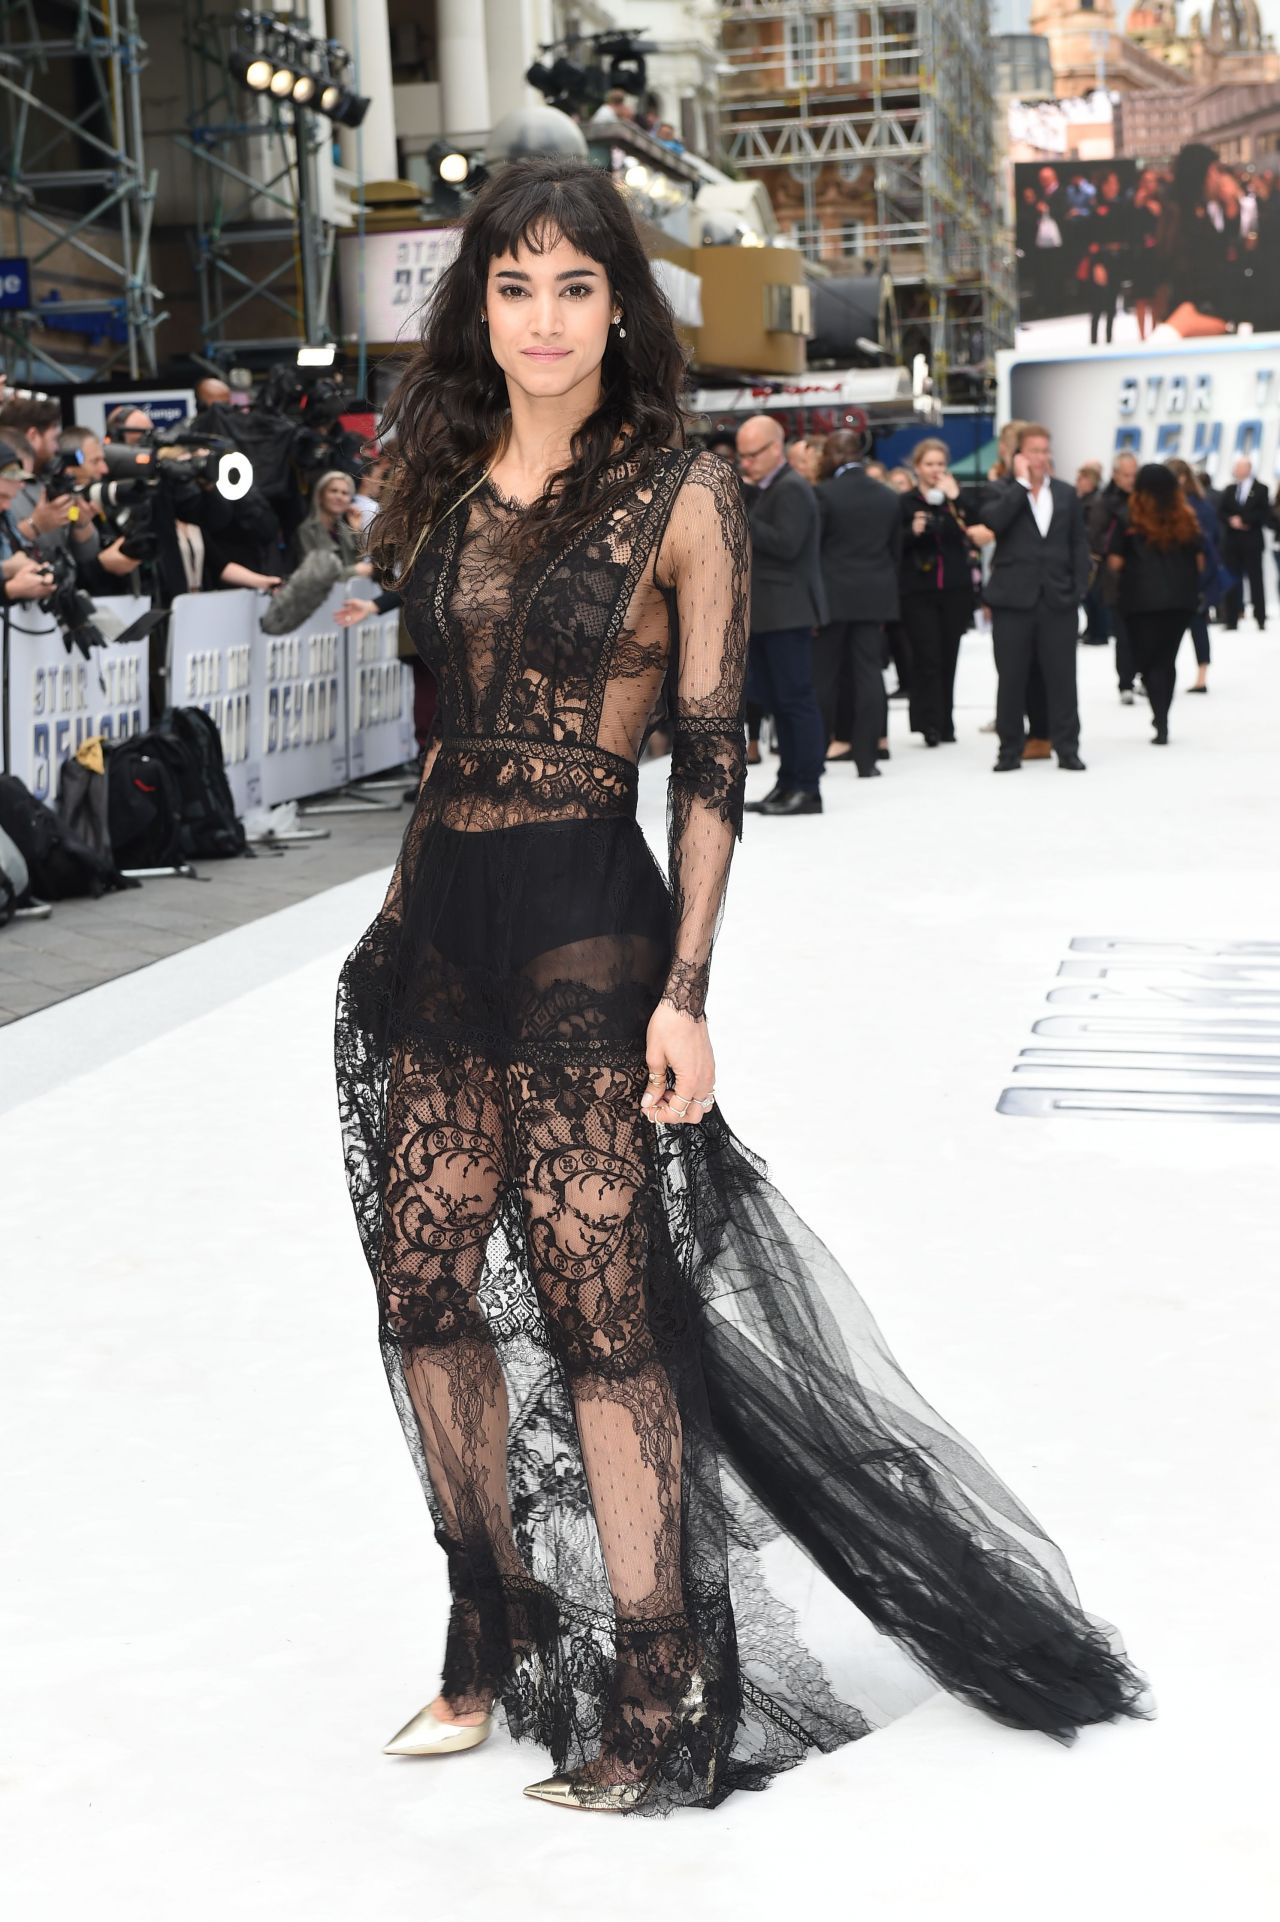 http://celebmafia.com/wp-content/uploads/2016/07/sofia-boutella-star-trek-beyond-premiere-in-london-uk-7-12-2016-1.jpg